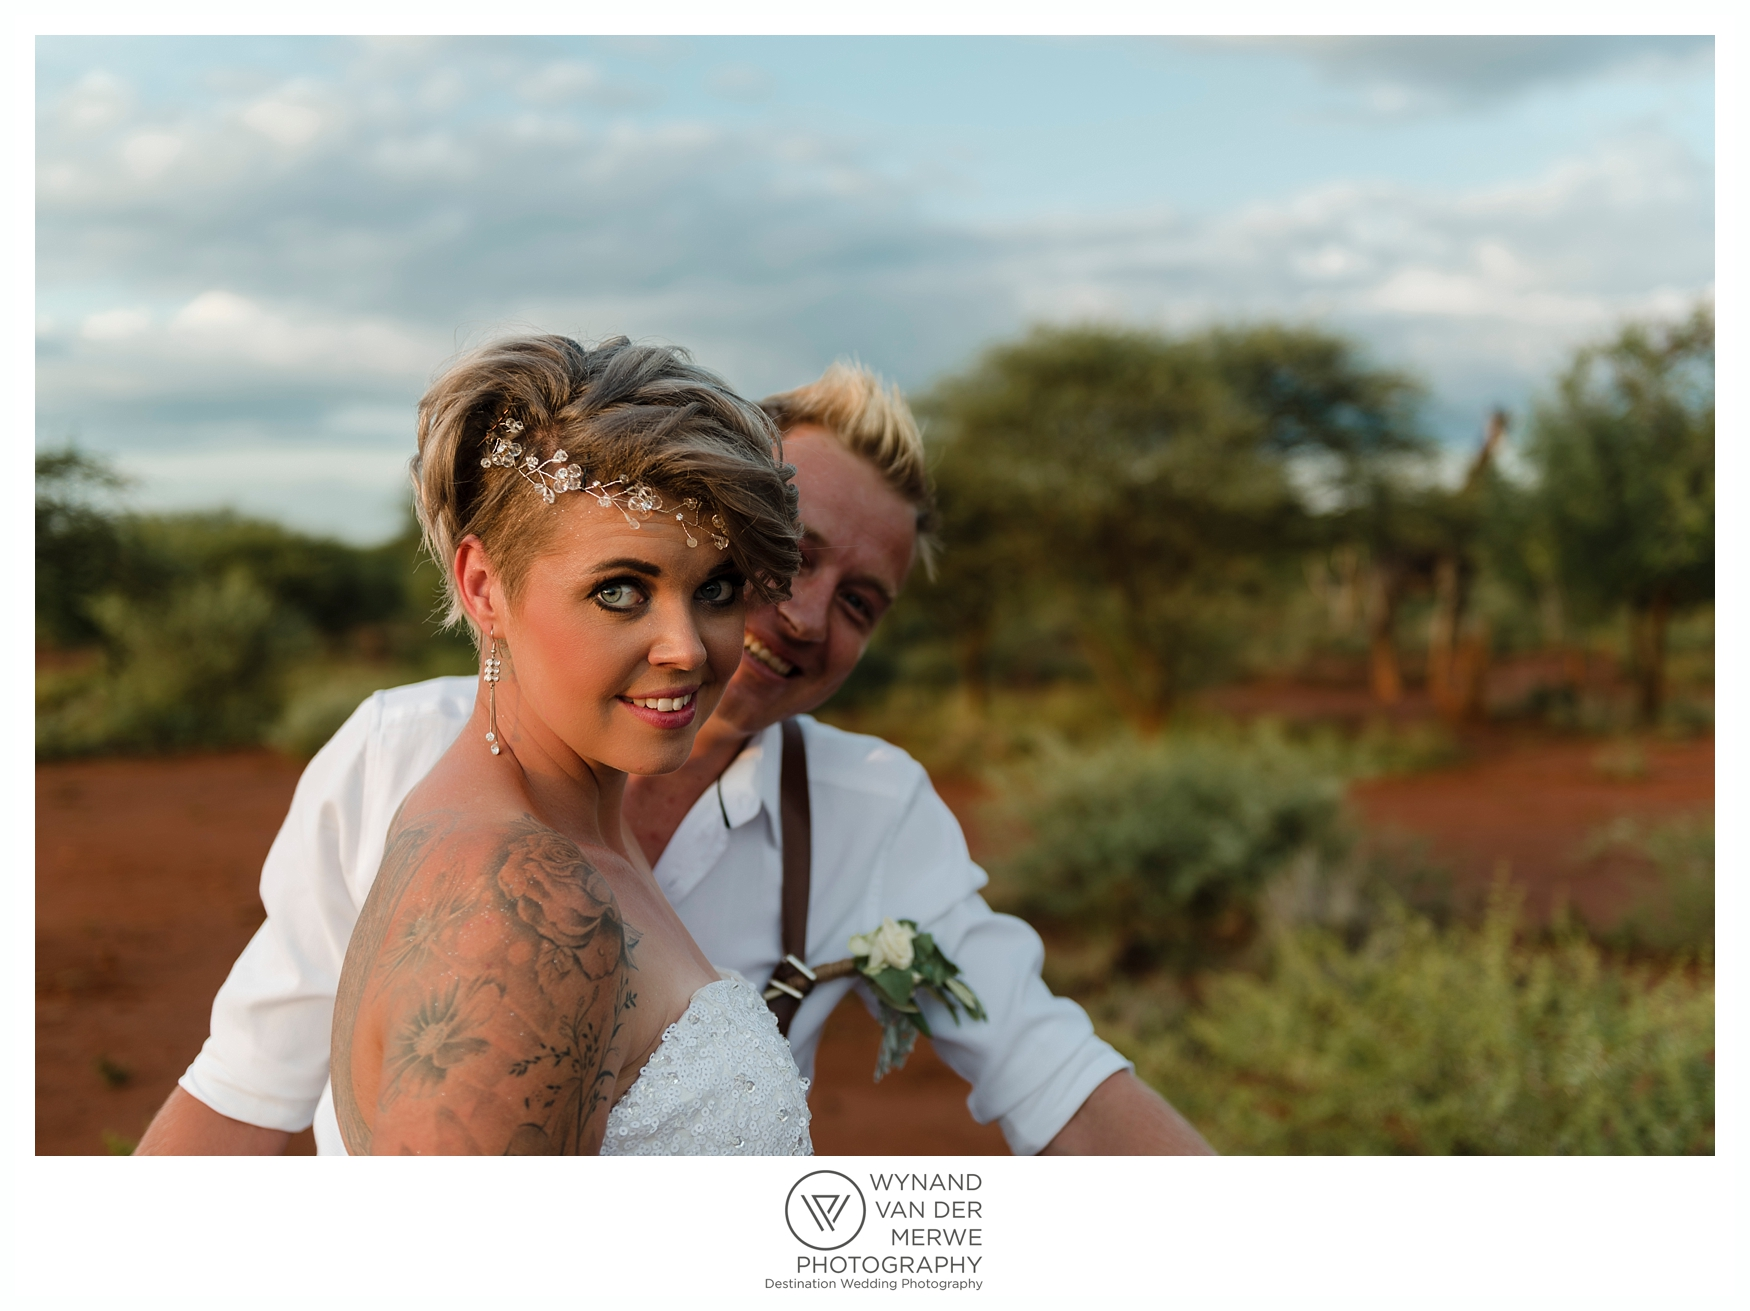 WynandvanderMerwe_weddingphotography_bushveldwedding_northam_bushveld_limpopowedding_limpopo_southafrica-274.jpg